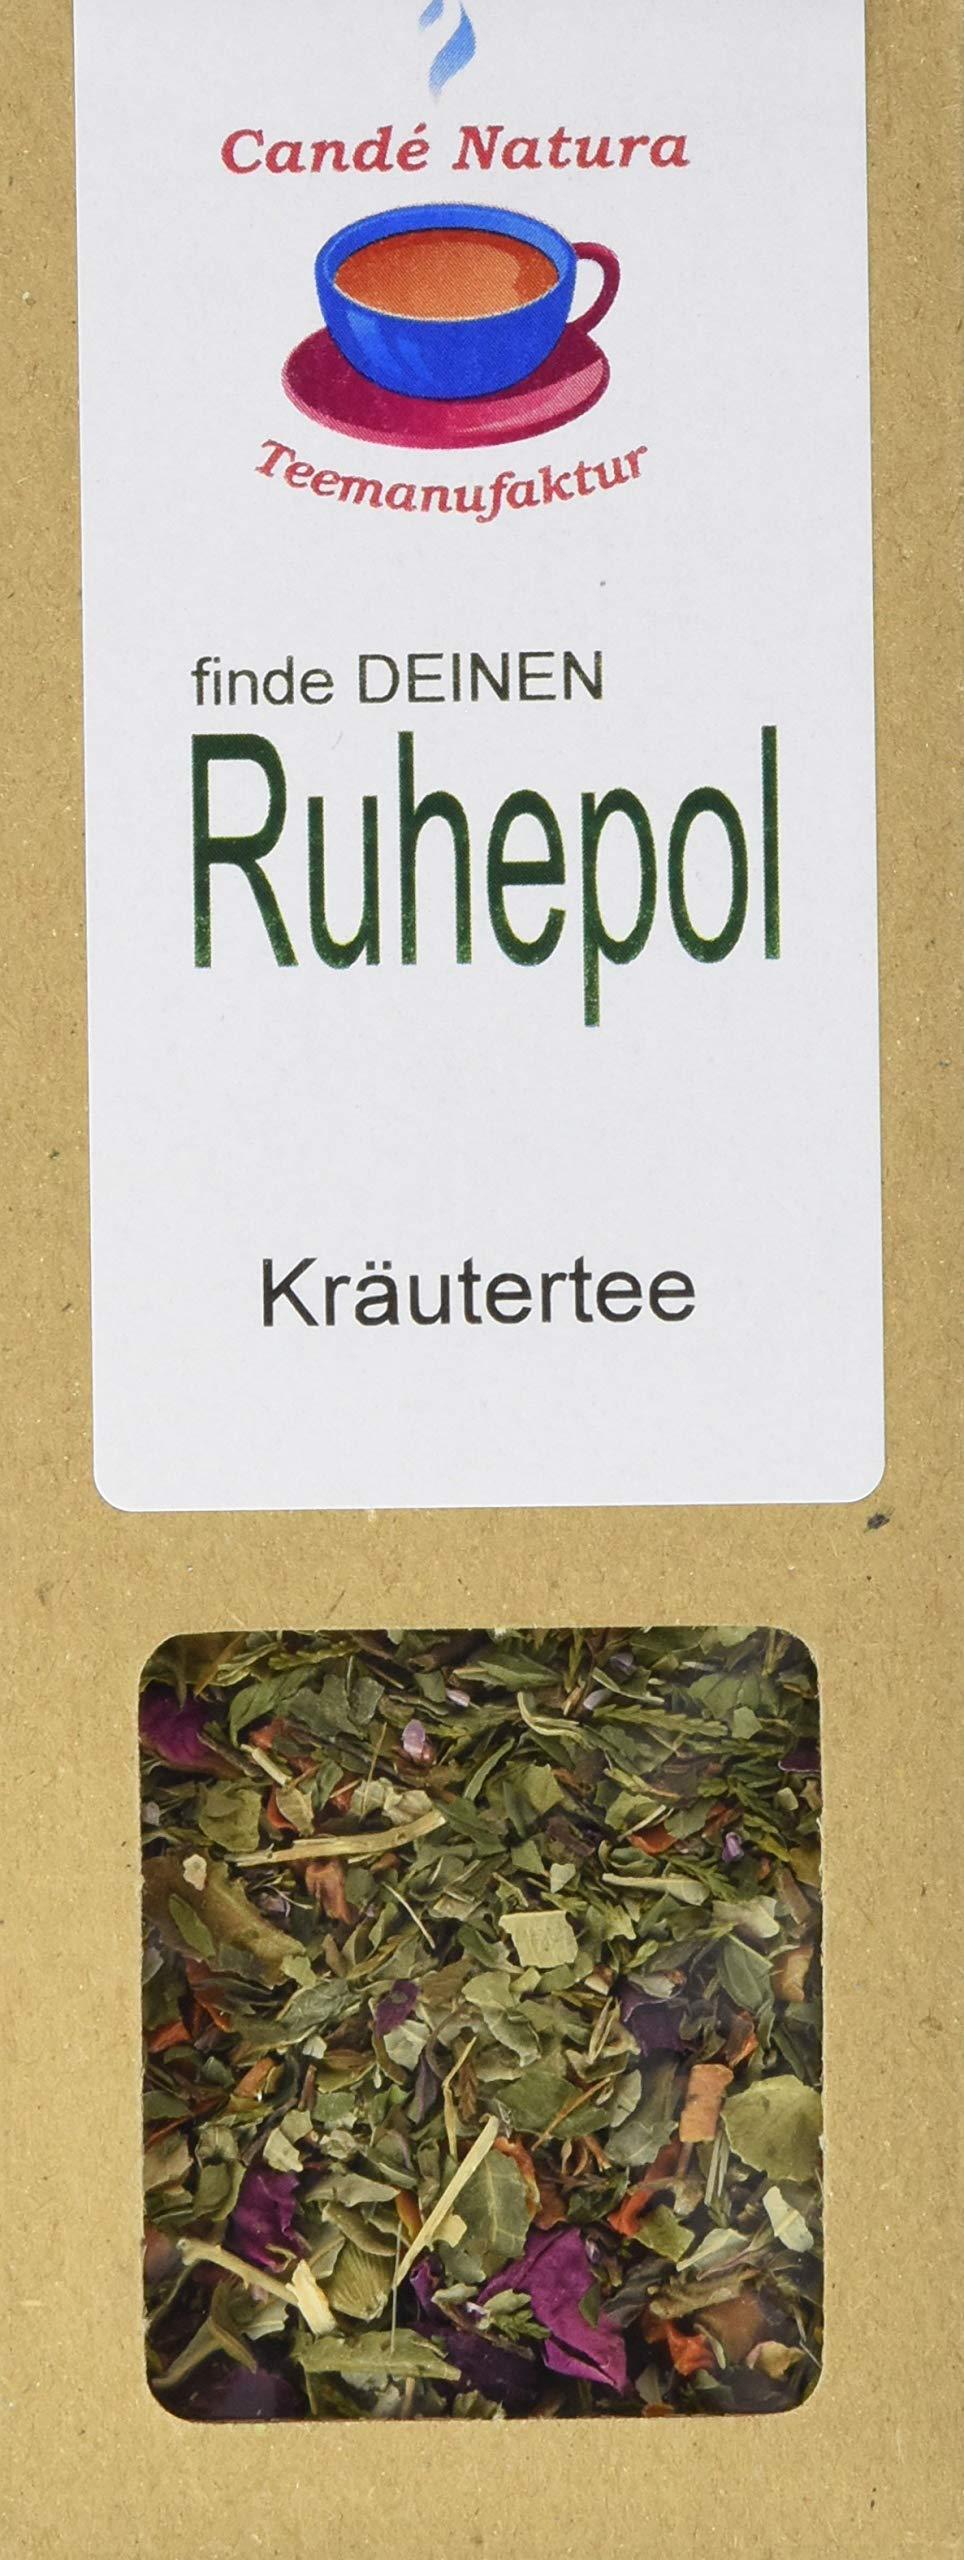 Cand-Natura-Teemanufaktur-Ruhepol-Kruterteemischung-5er-Pack-5-x-50-g